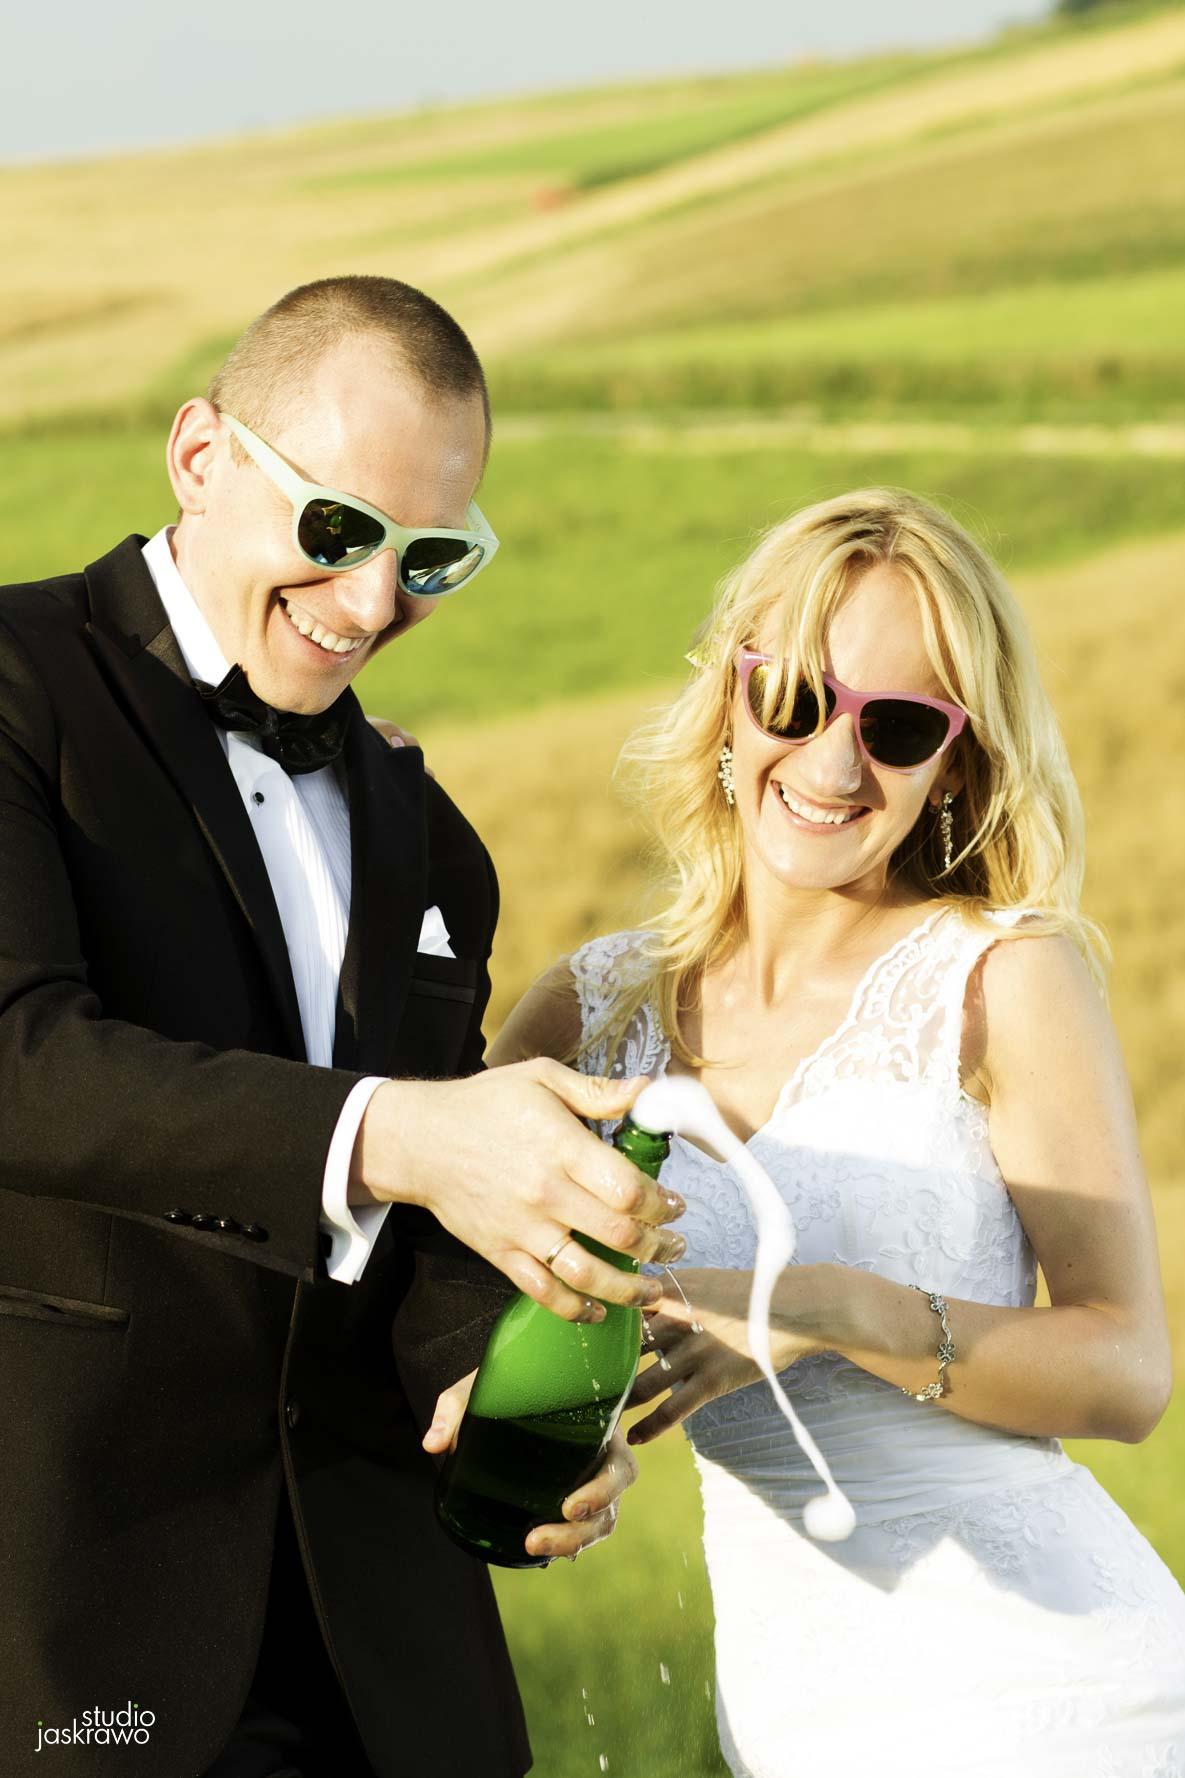 para młoda pije szampana